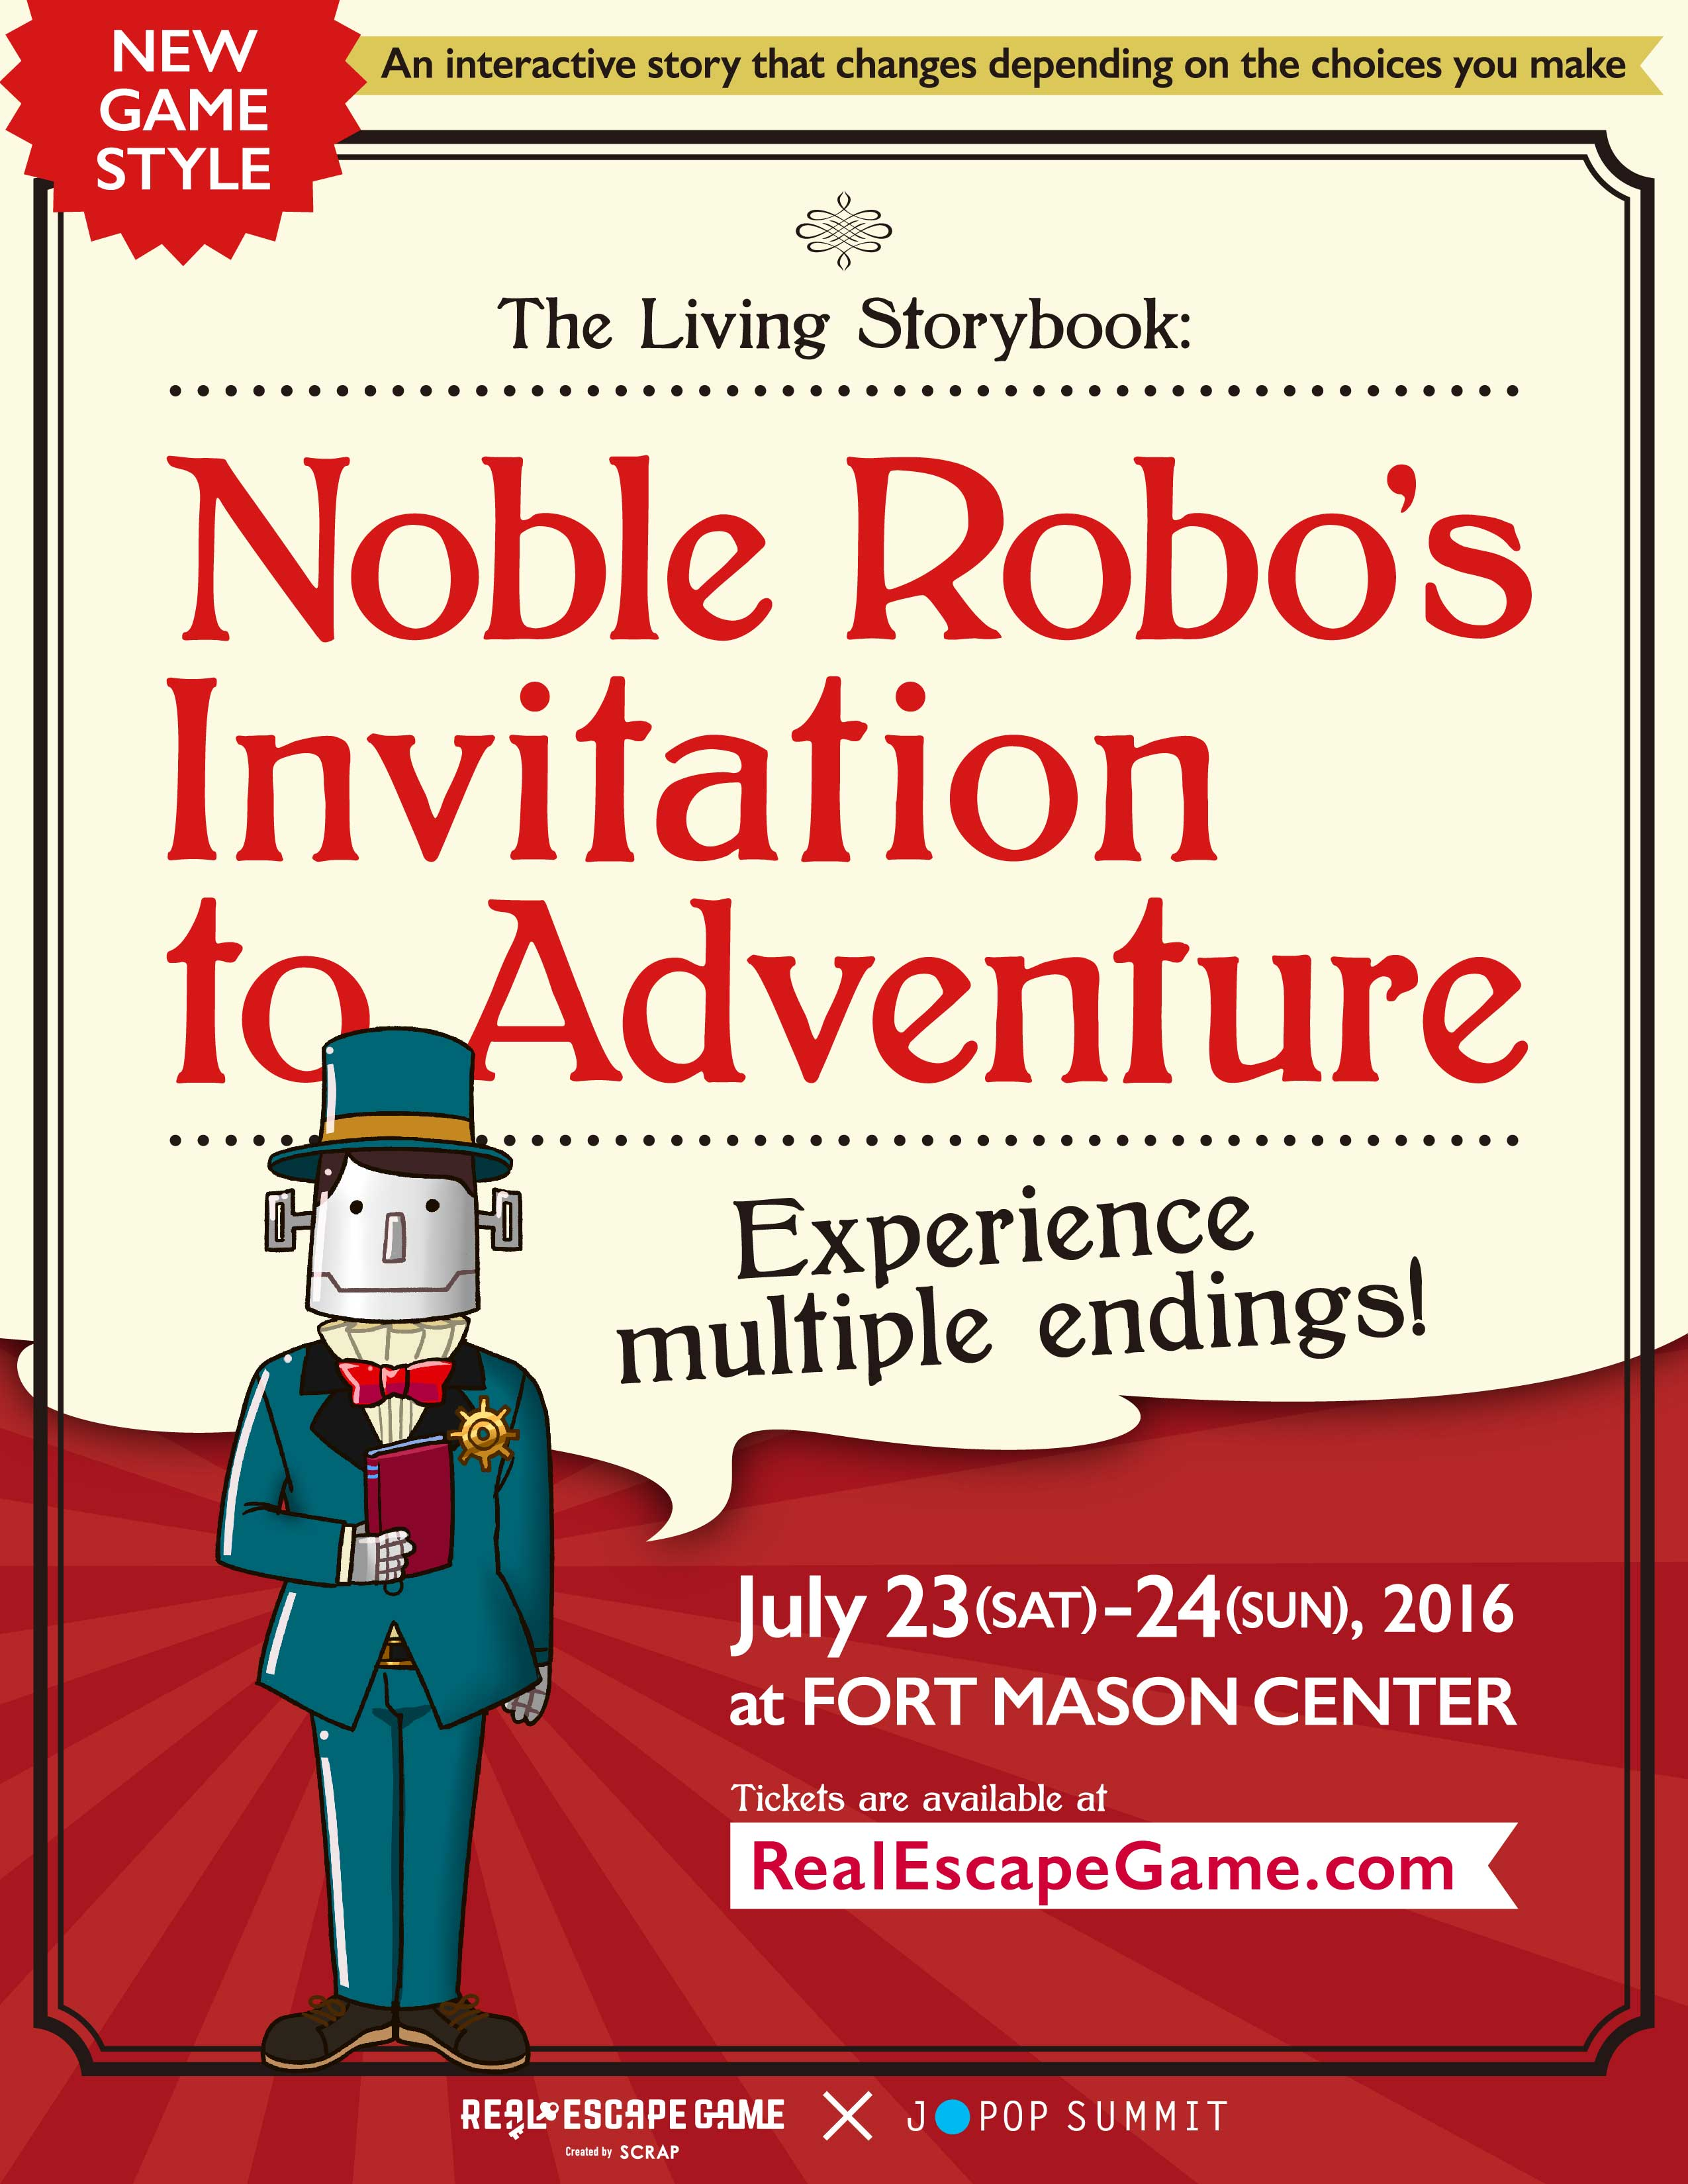 NobleRobo